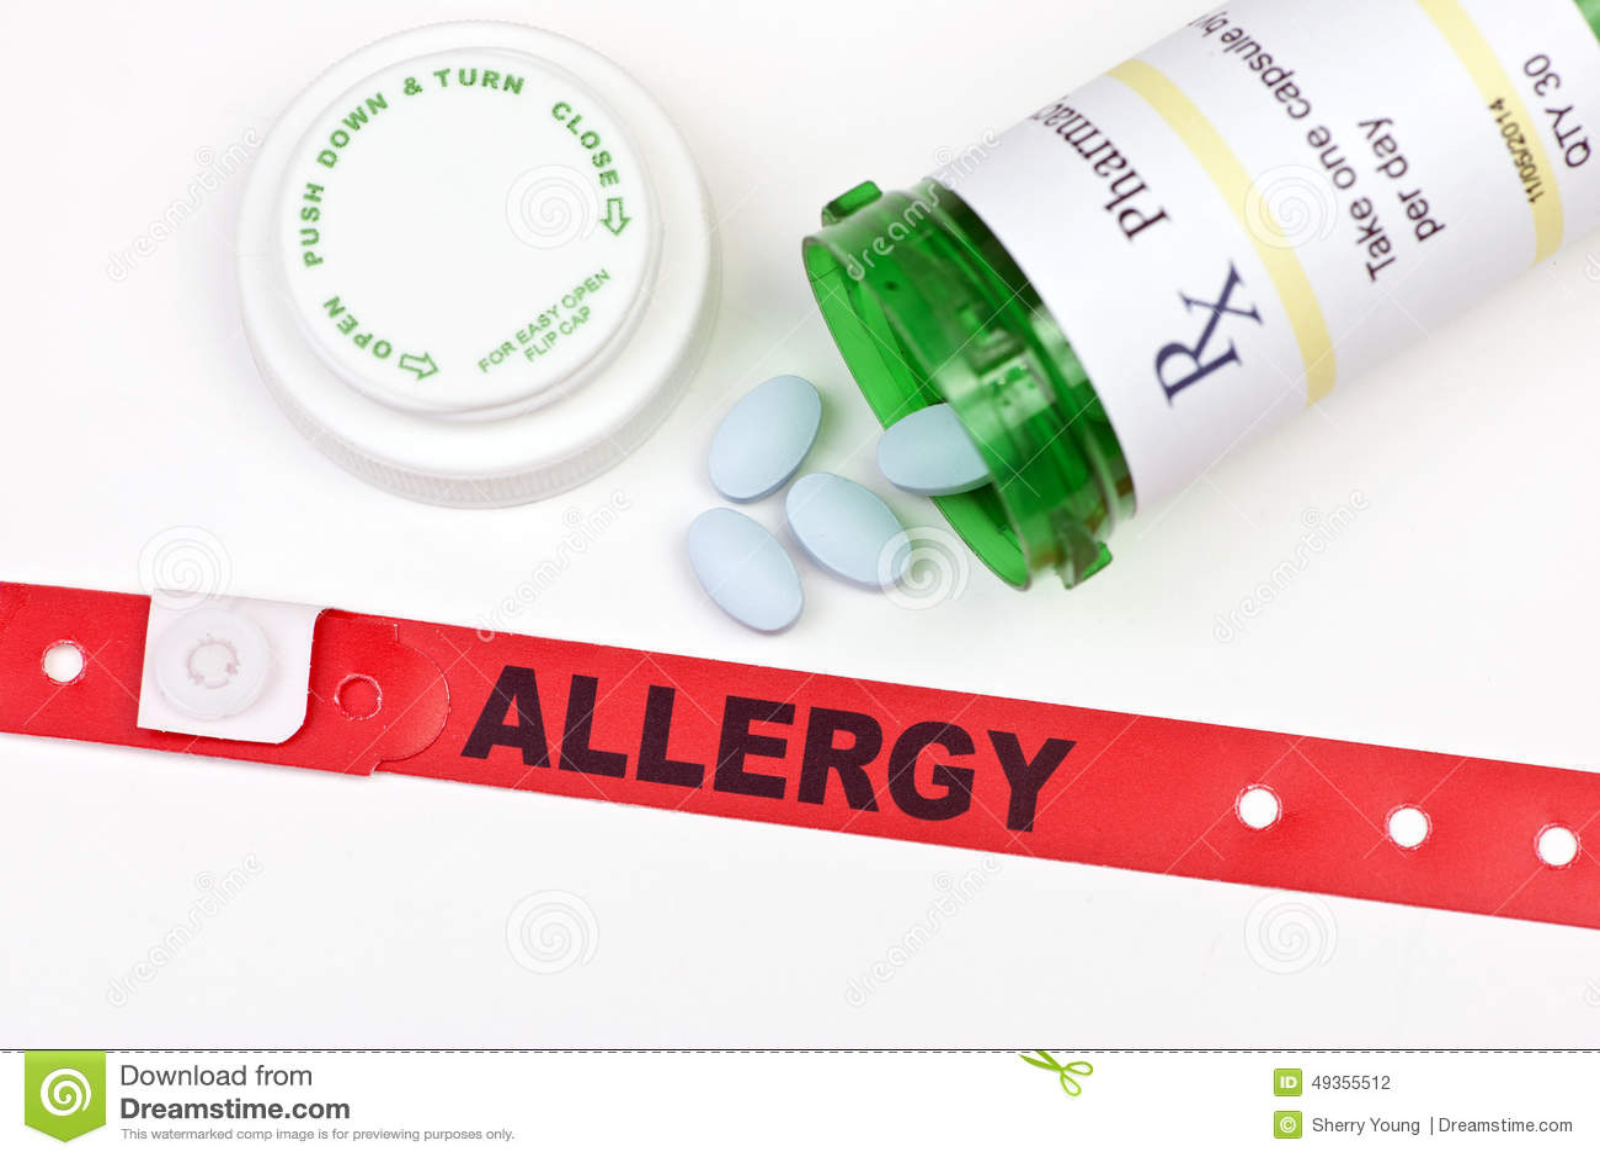 Seasonal Allergies Treatments